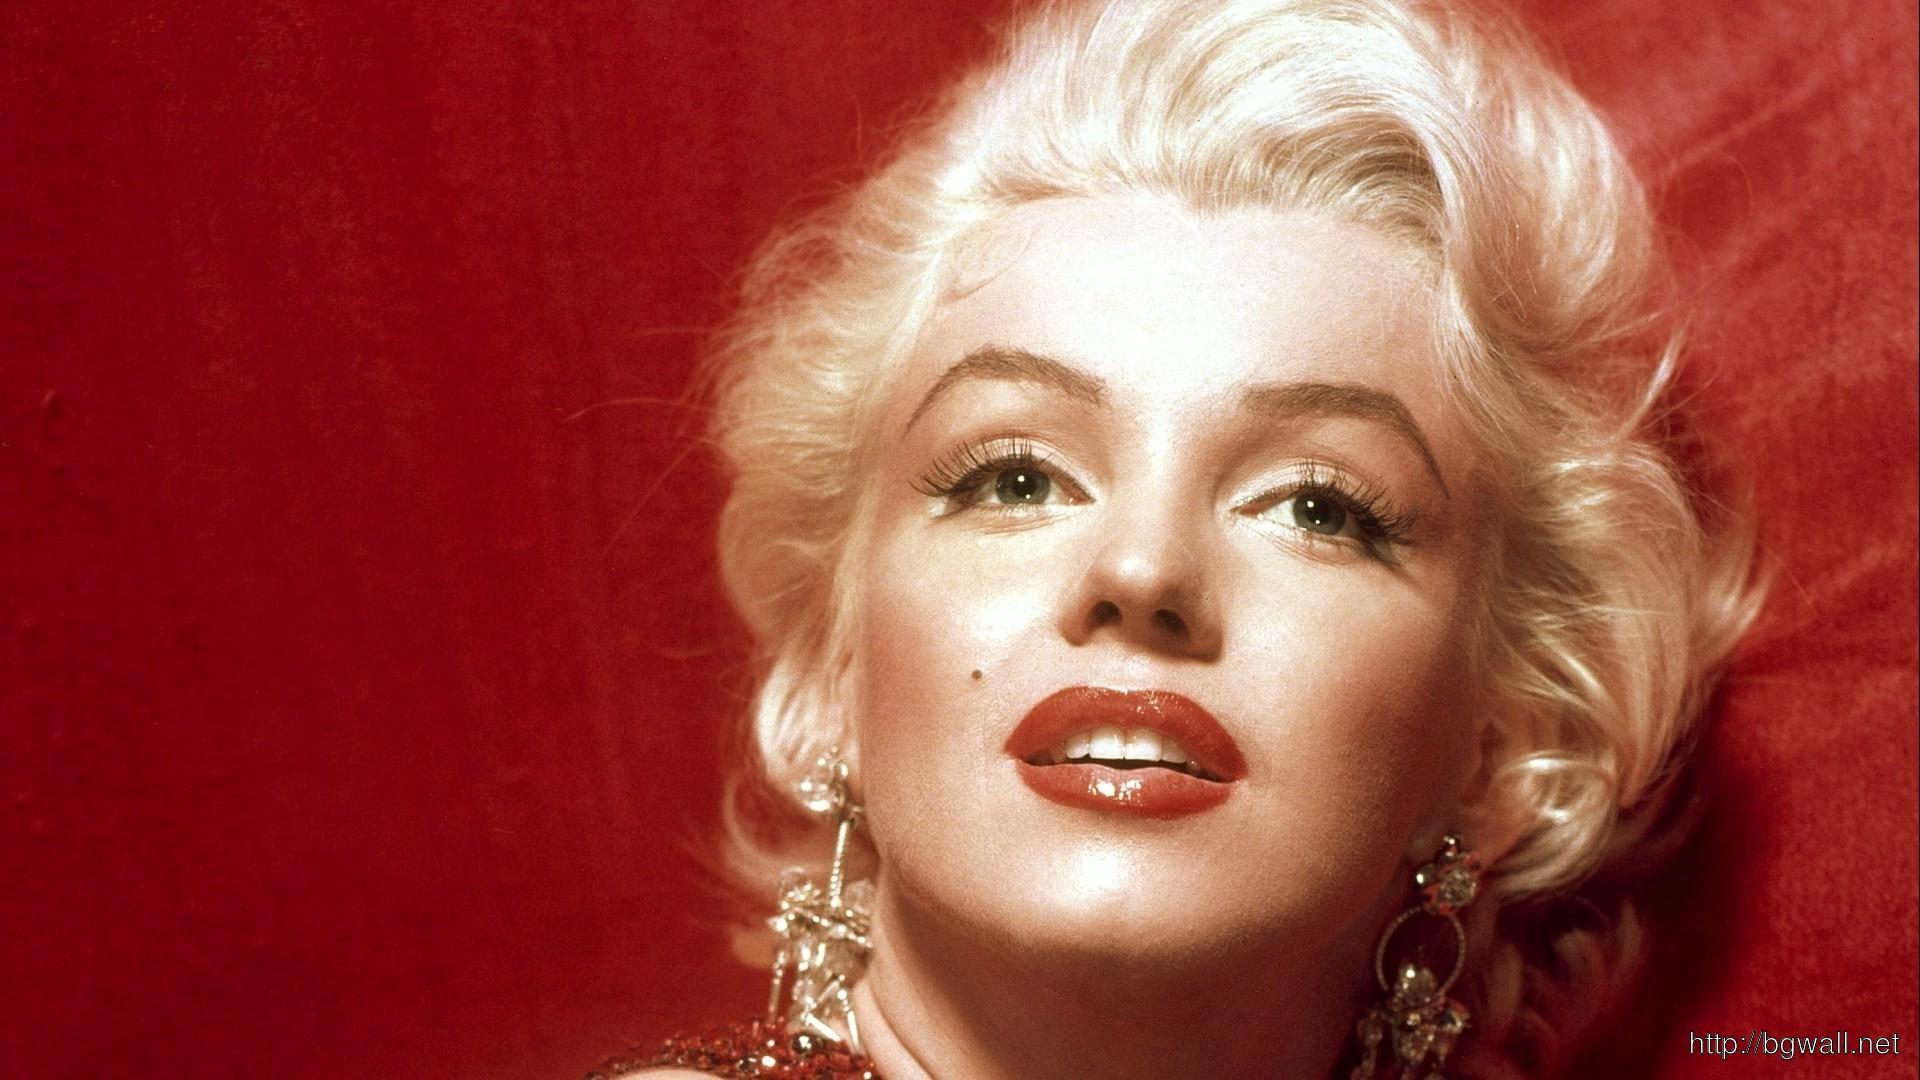 Marilyn Monroe Wallpaper 4862 Full Size